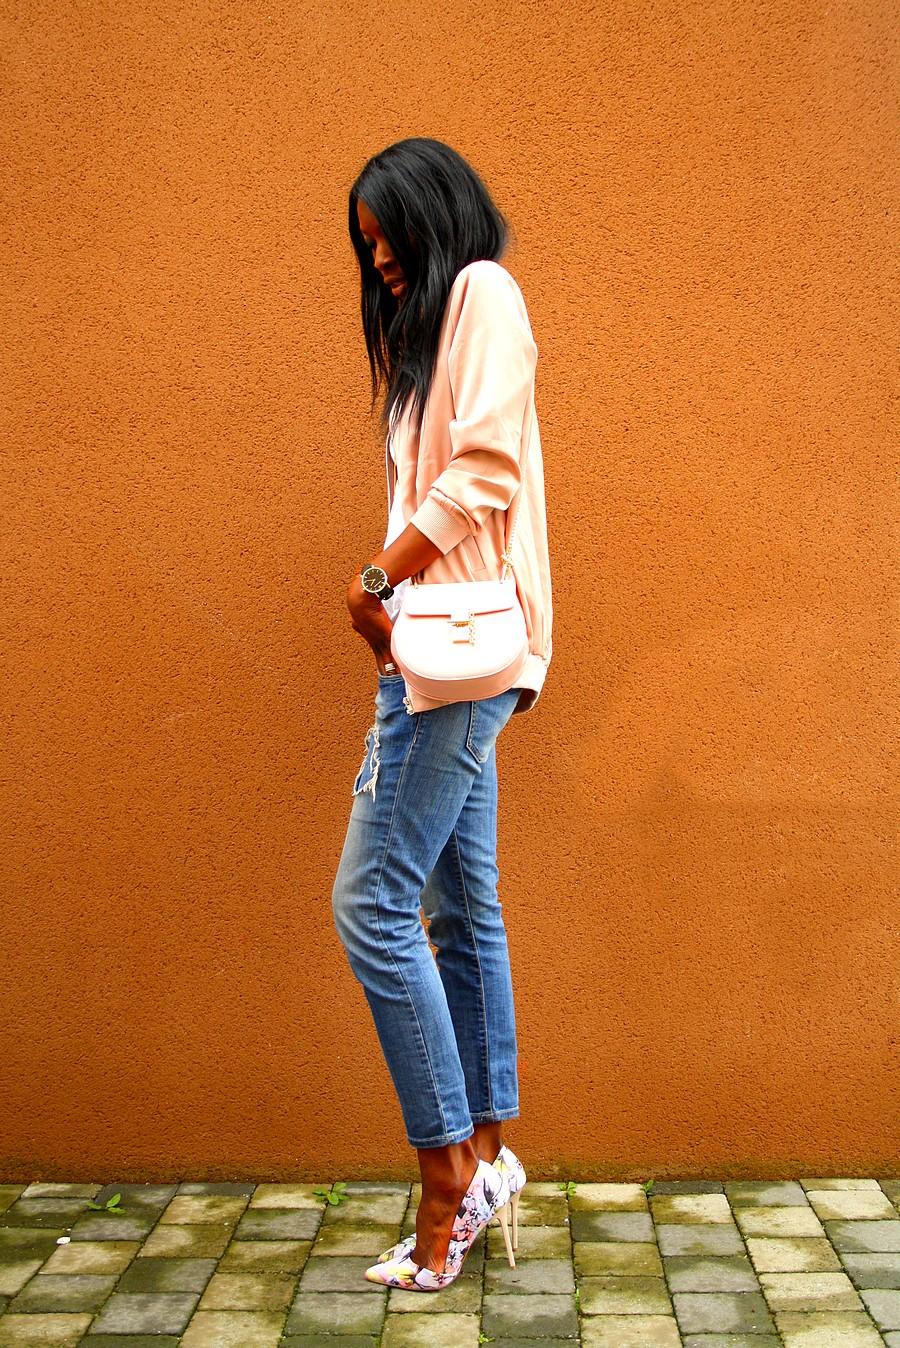 chloe-drew-bag-bombers-rose-satin-jeans-dechiré-zara-escarpins-imprimés